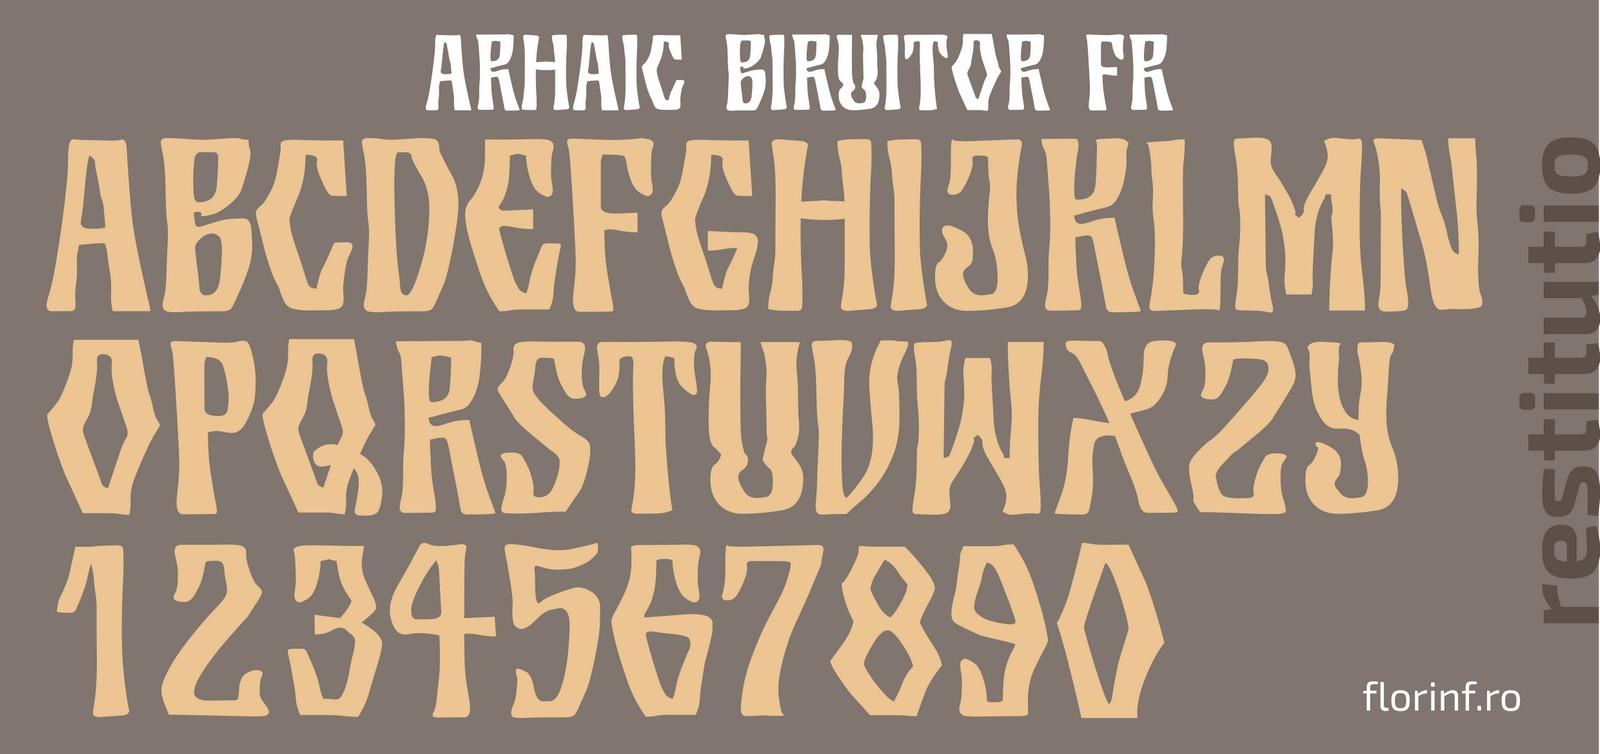 Arhaic Biruitor FR